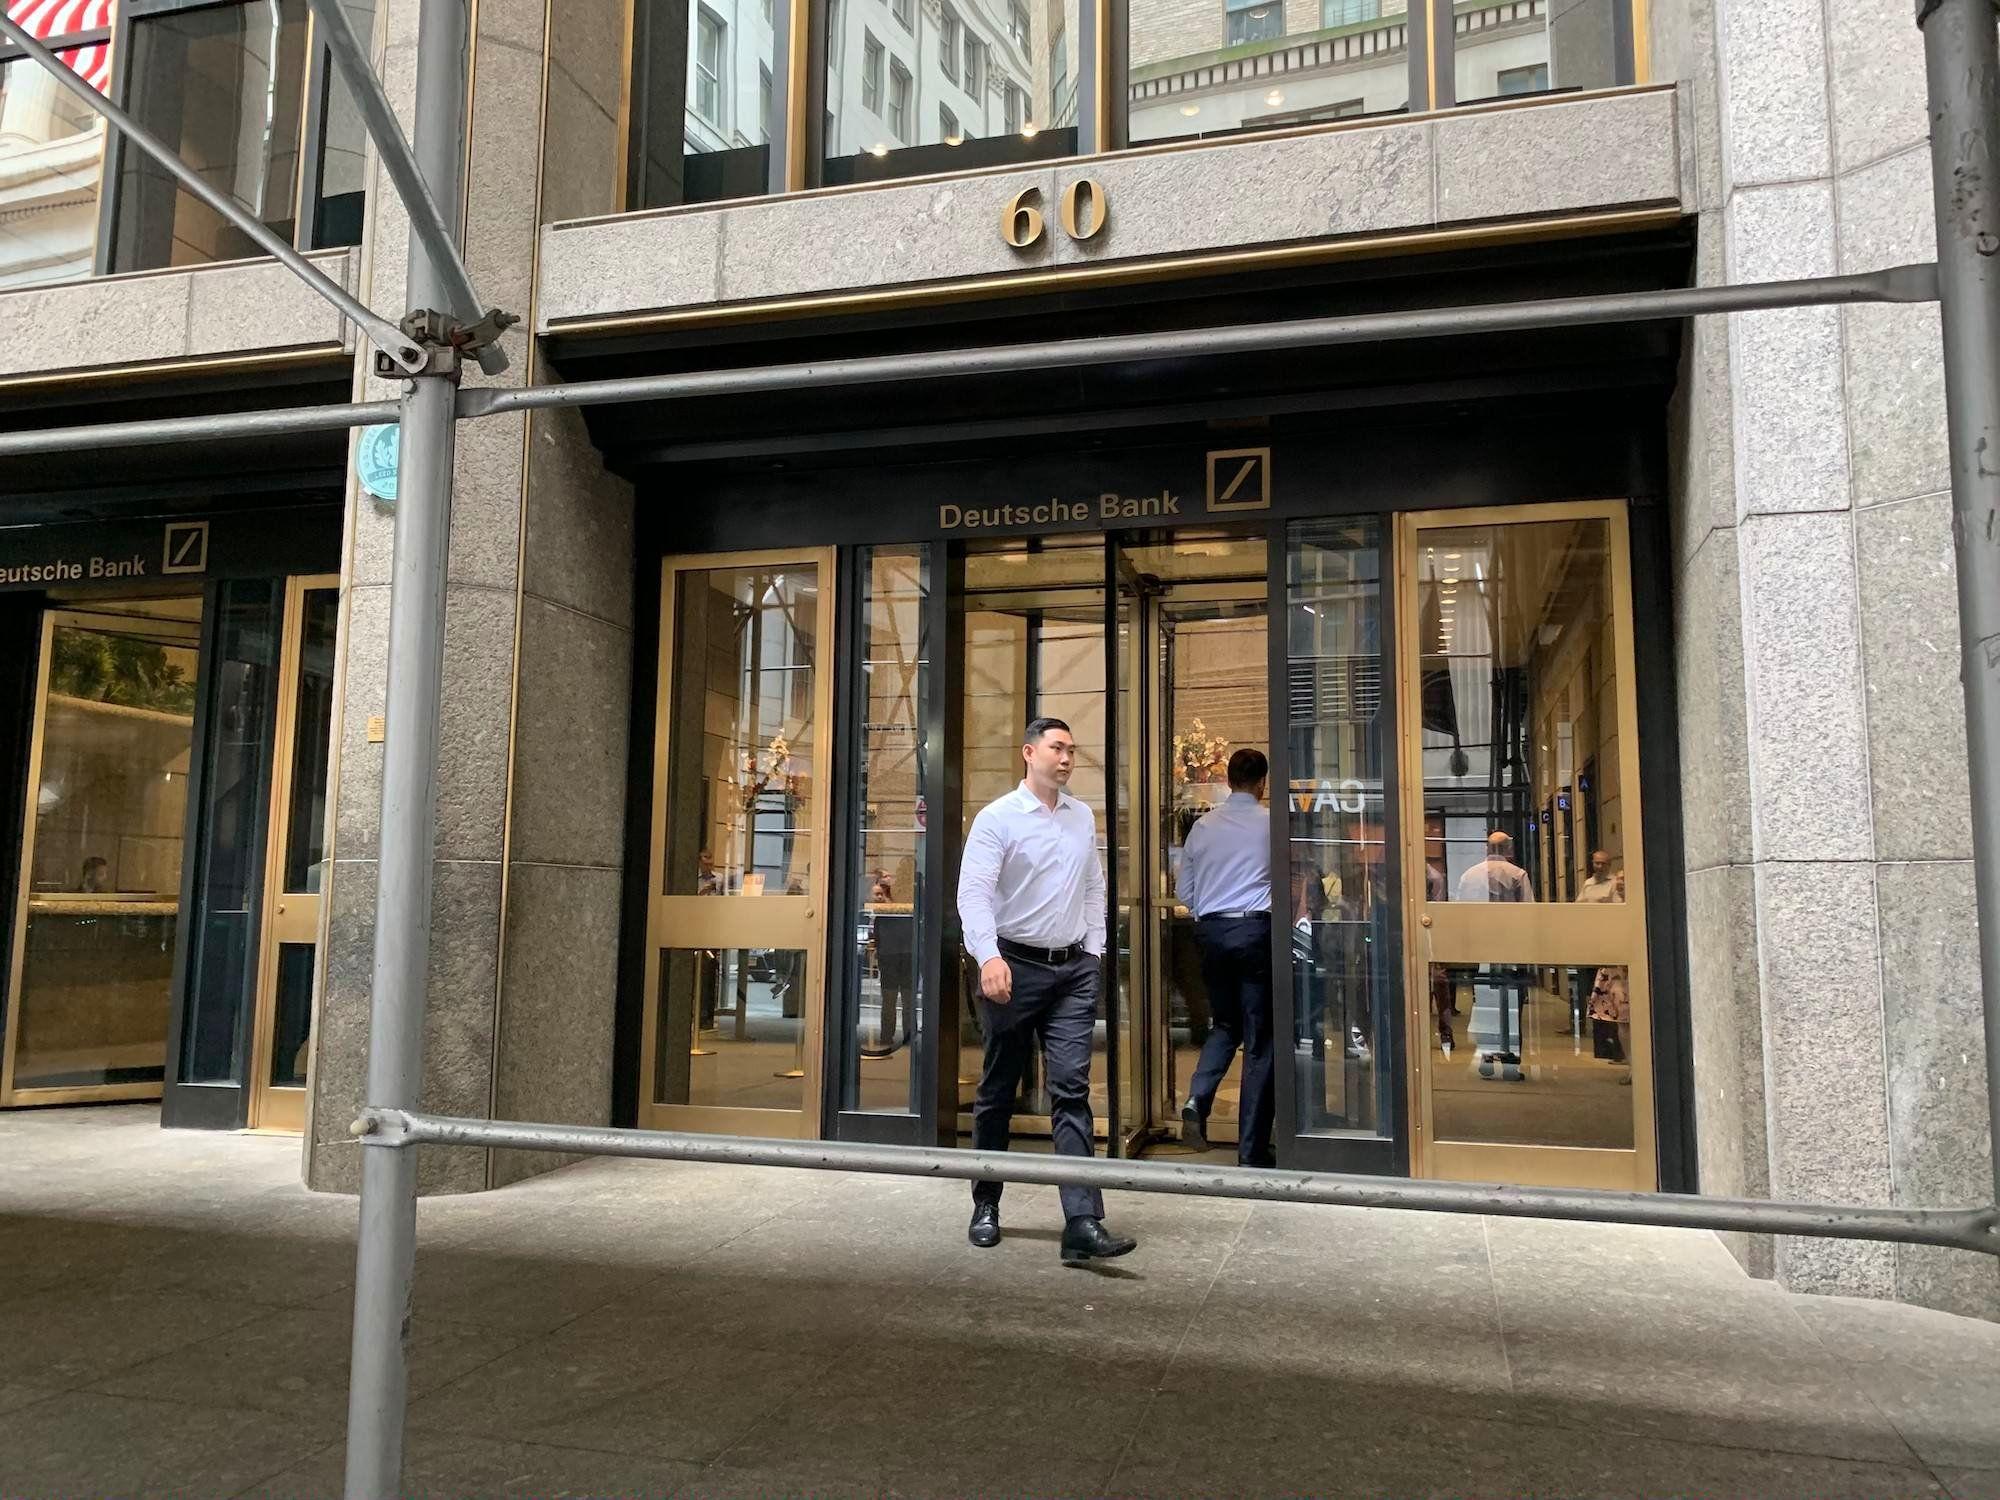 We stood outside Deutsche Bank's New York office as staff